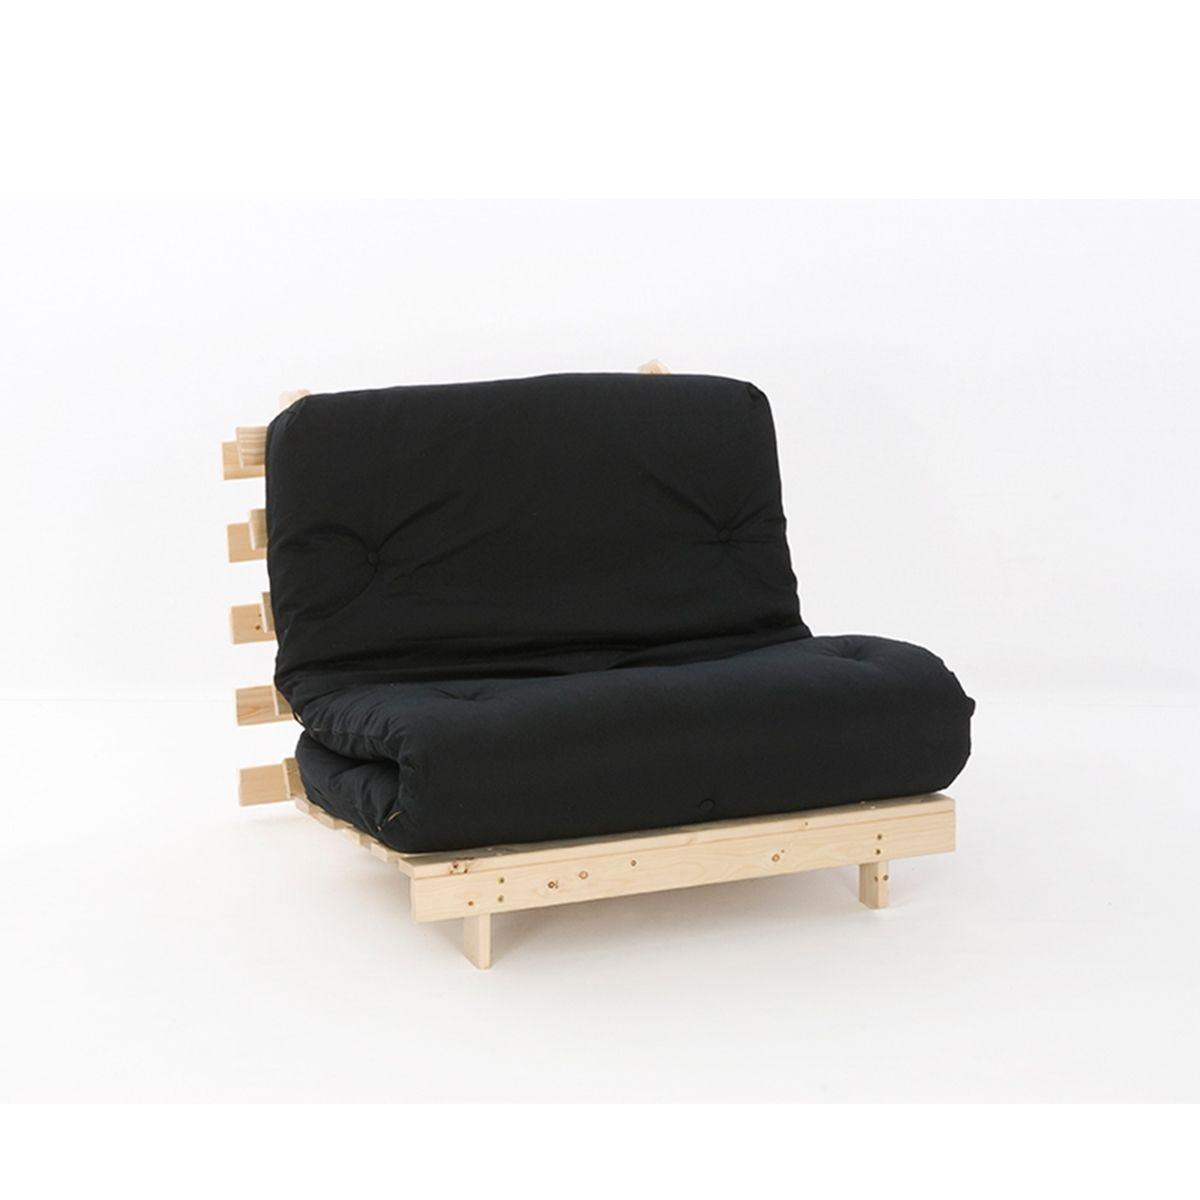 Ayr Futon Set With Tufted Mattress - Black